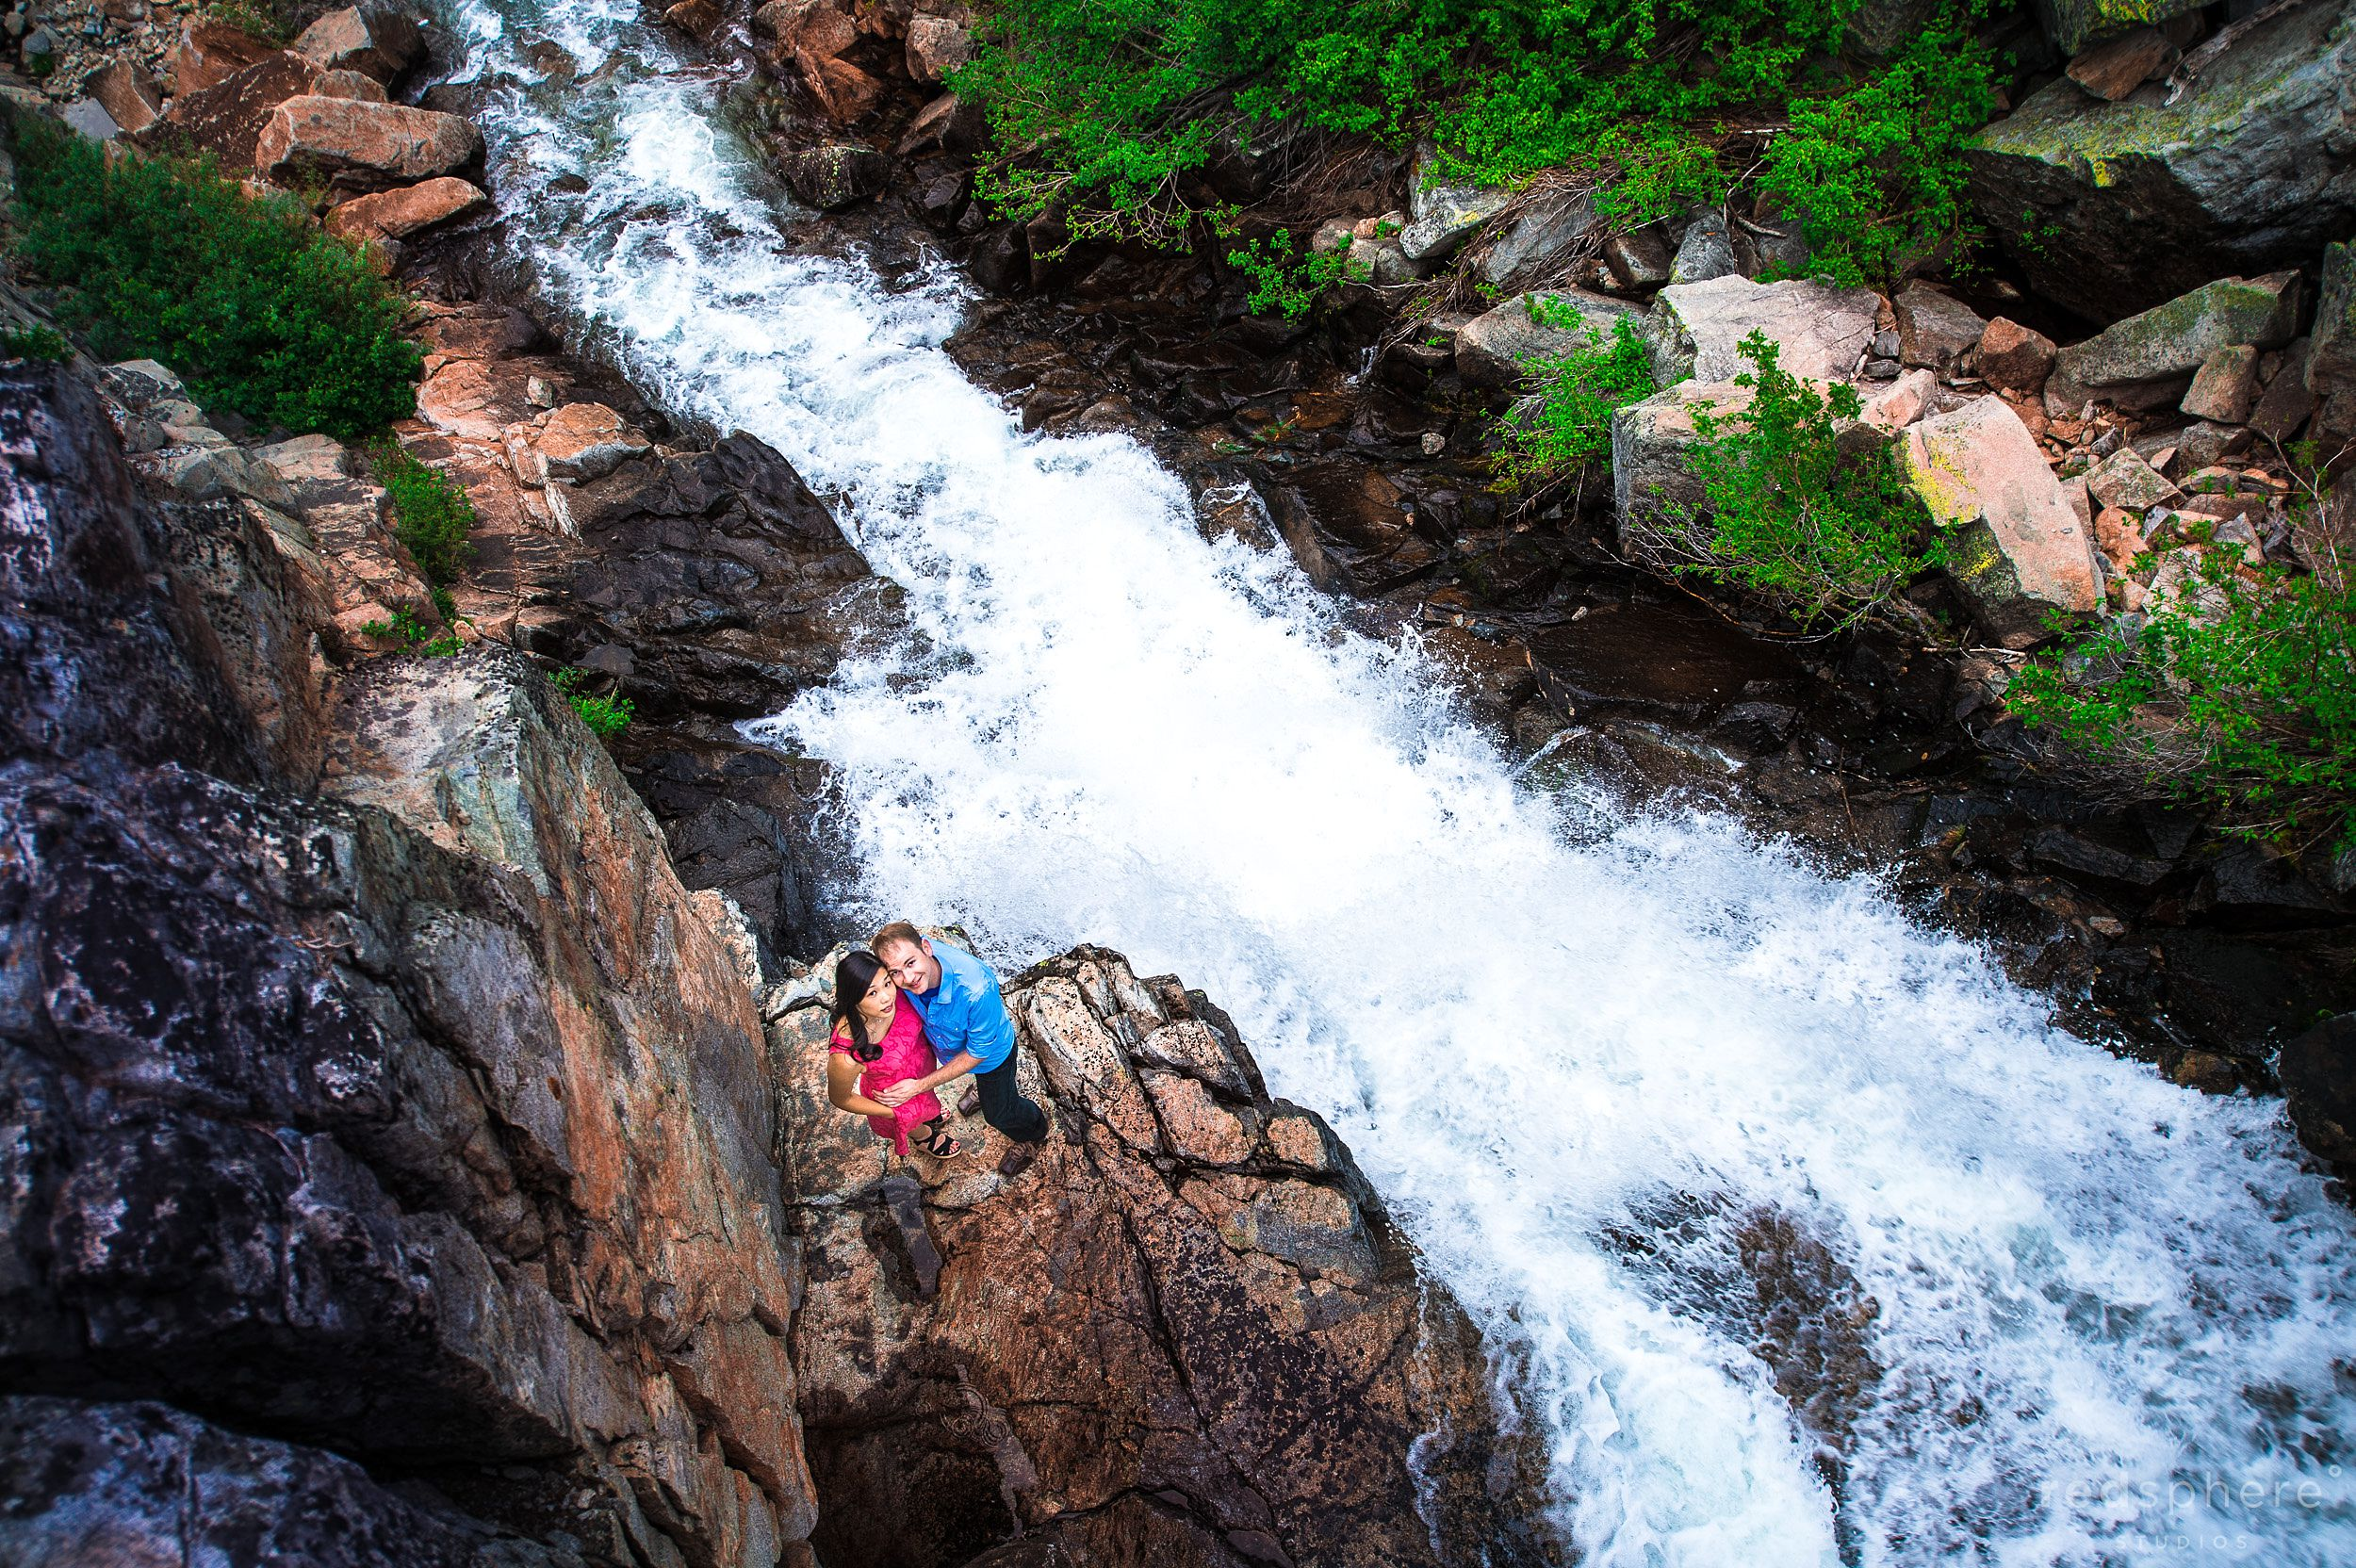 Couple Get Cozy on Rocks Along Roaring Lake Tahoe Waterfalls